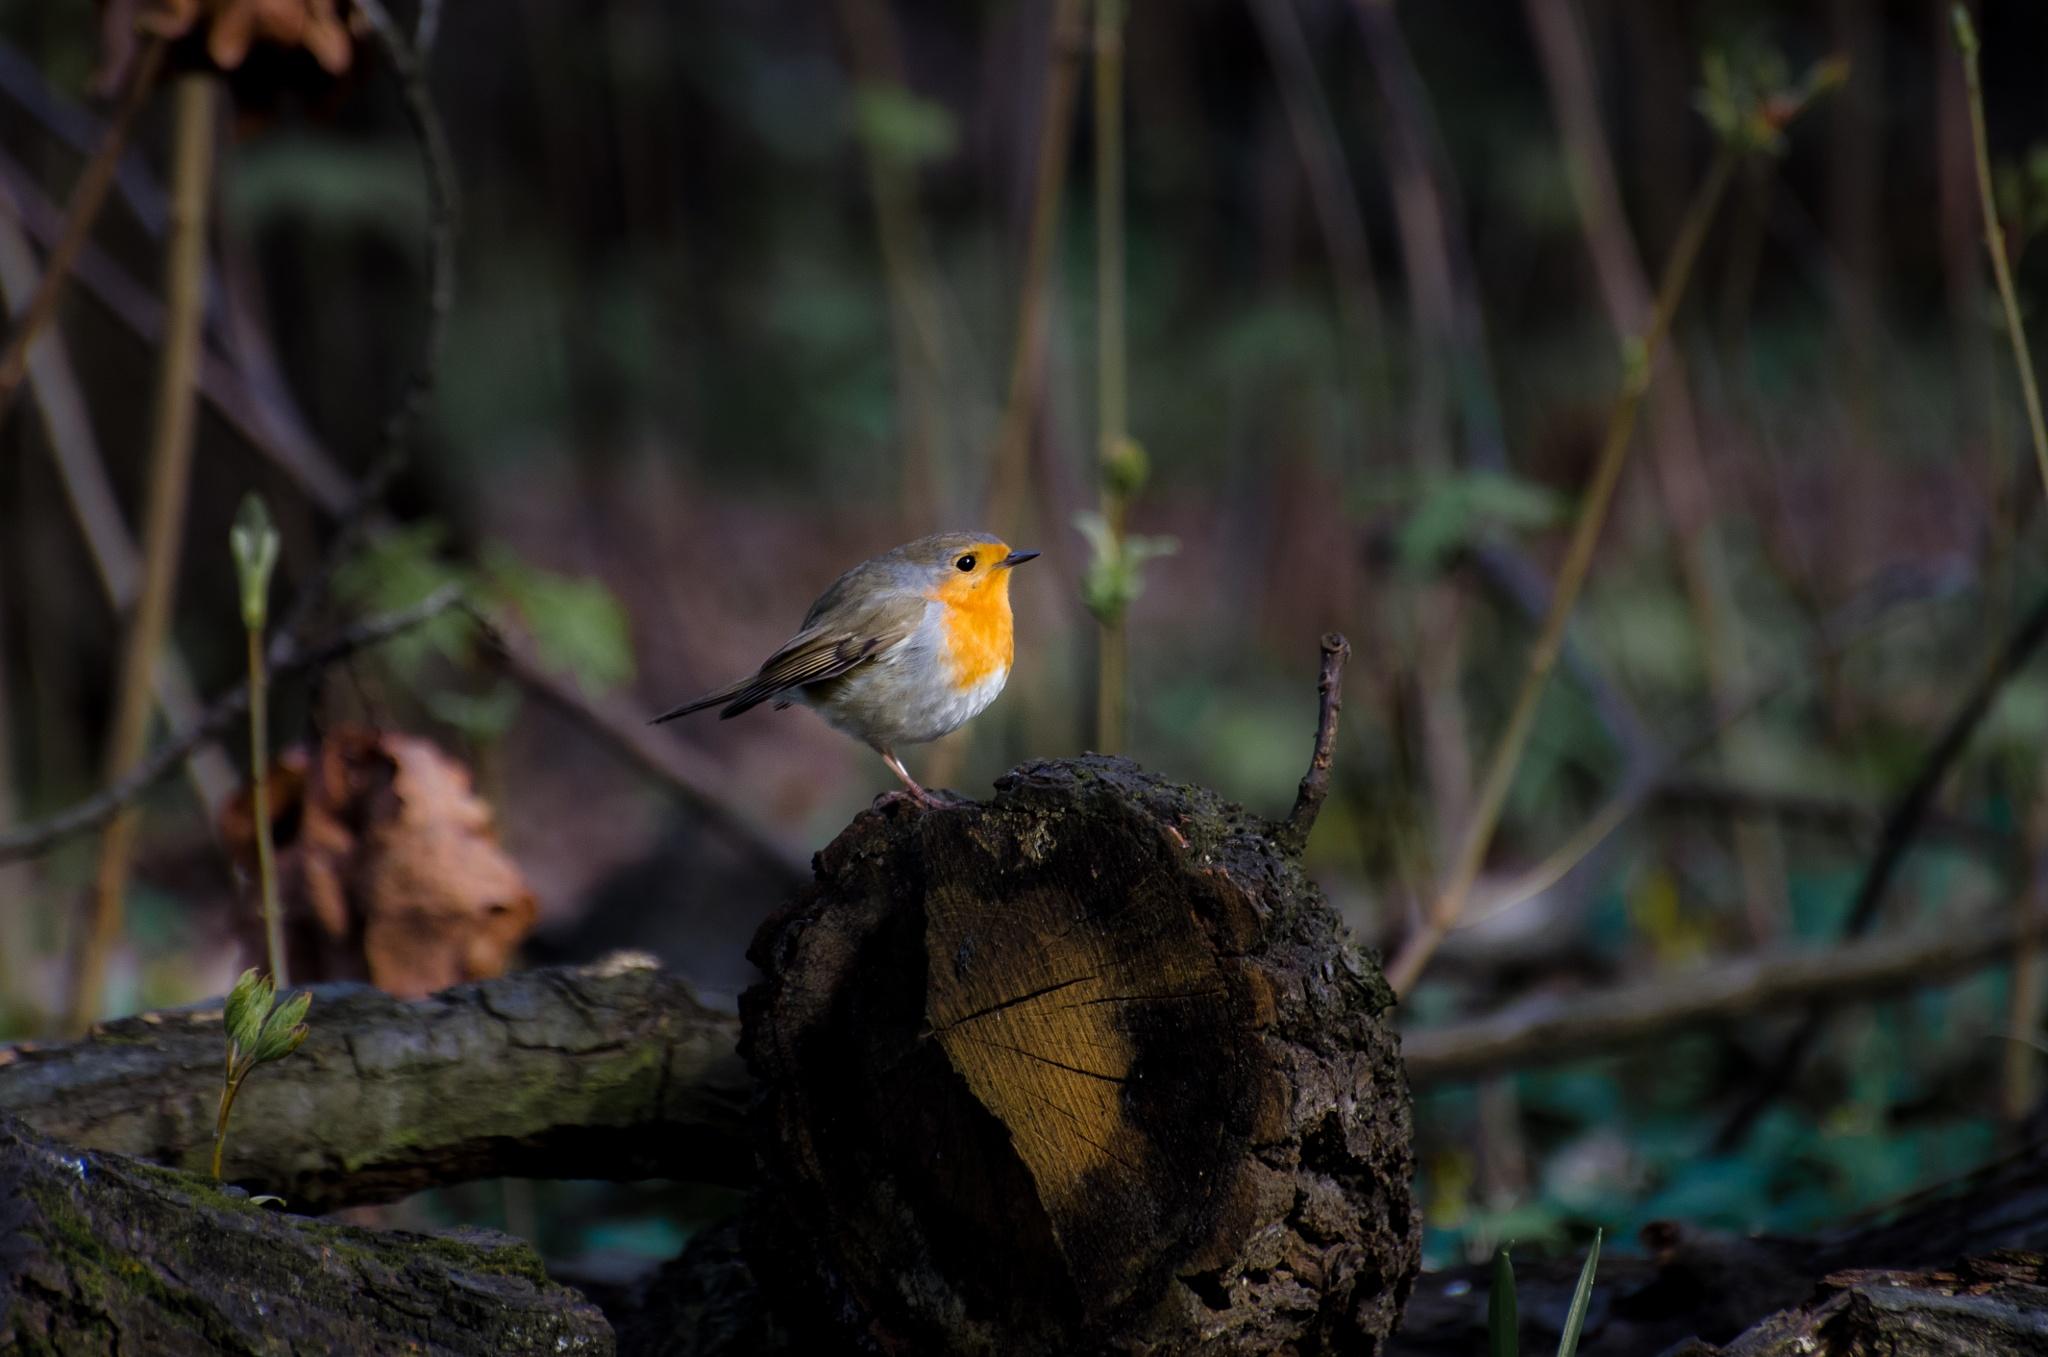 European robin by Marianne Drews